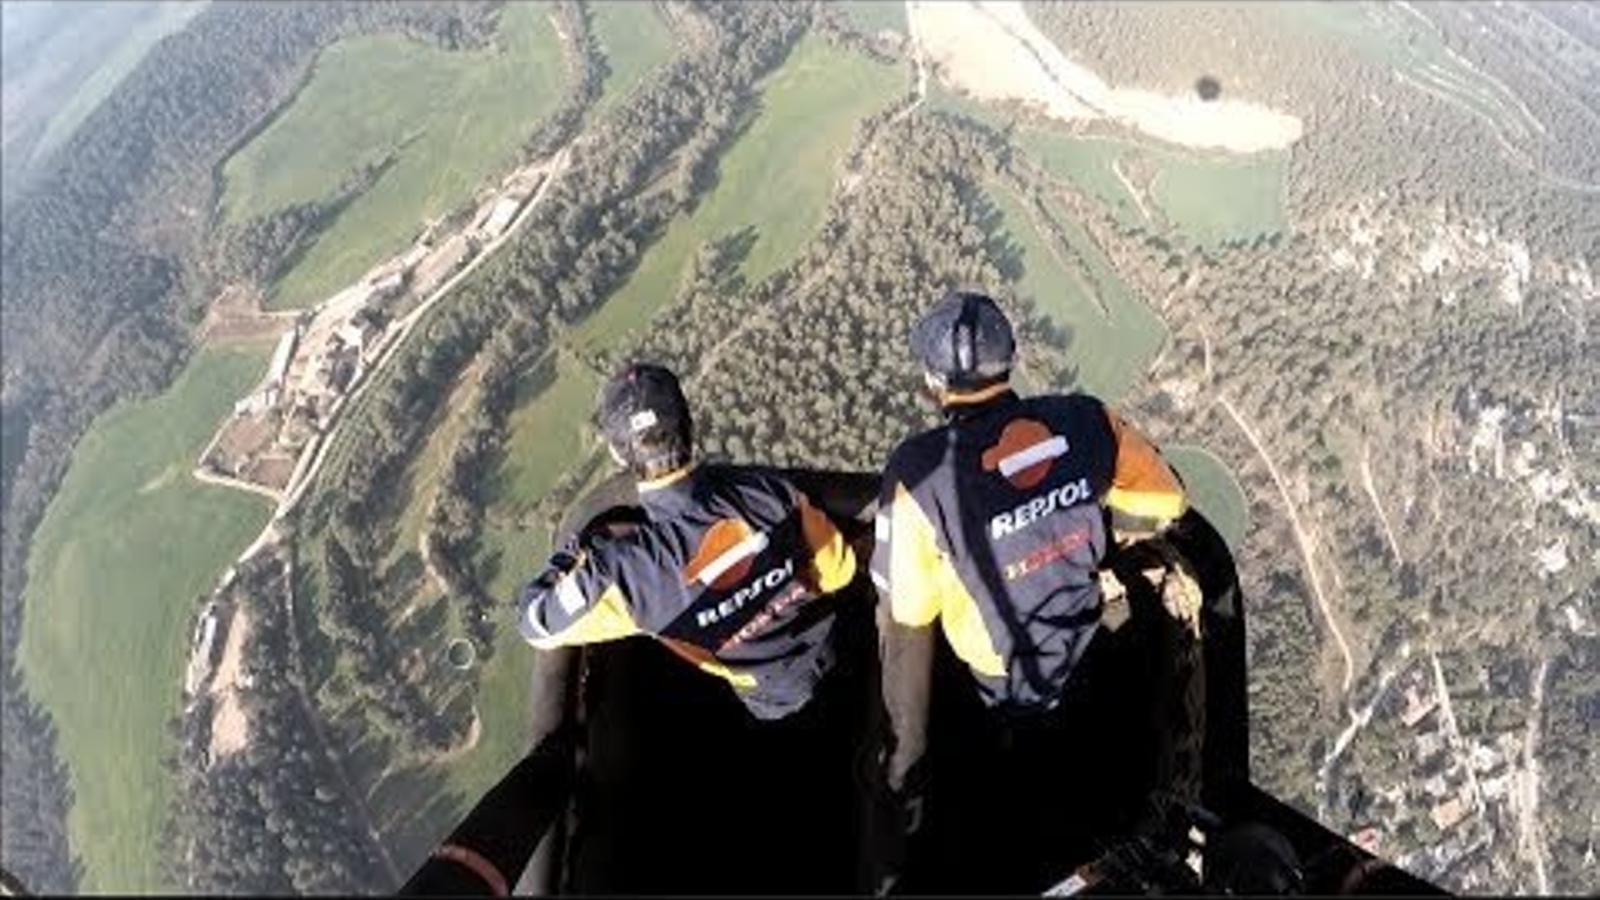 Marc Márquez i Dani Pedrosa arriben a Montmeló en globus